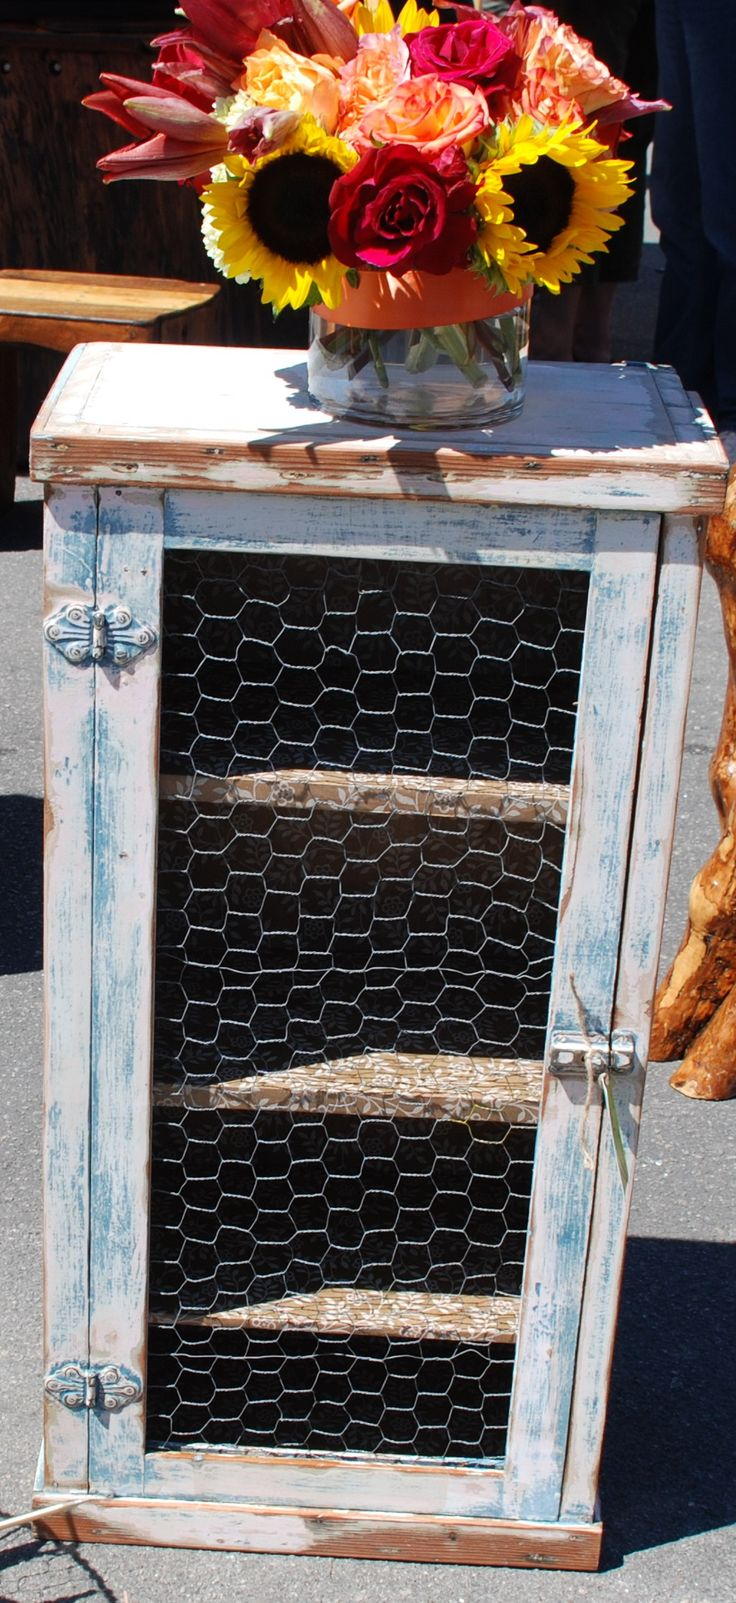 Kitchen Cabinet With Chicken Wire Farmhouse Chic Shabby